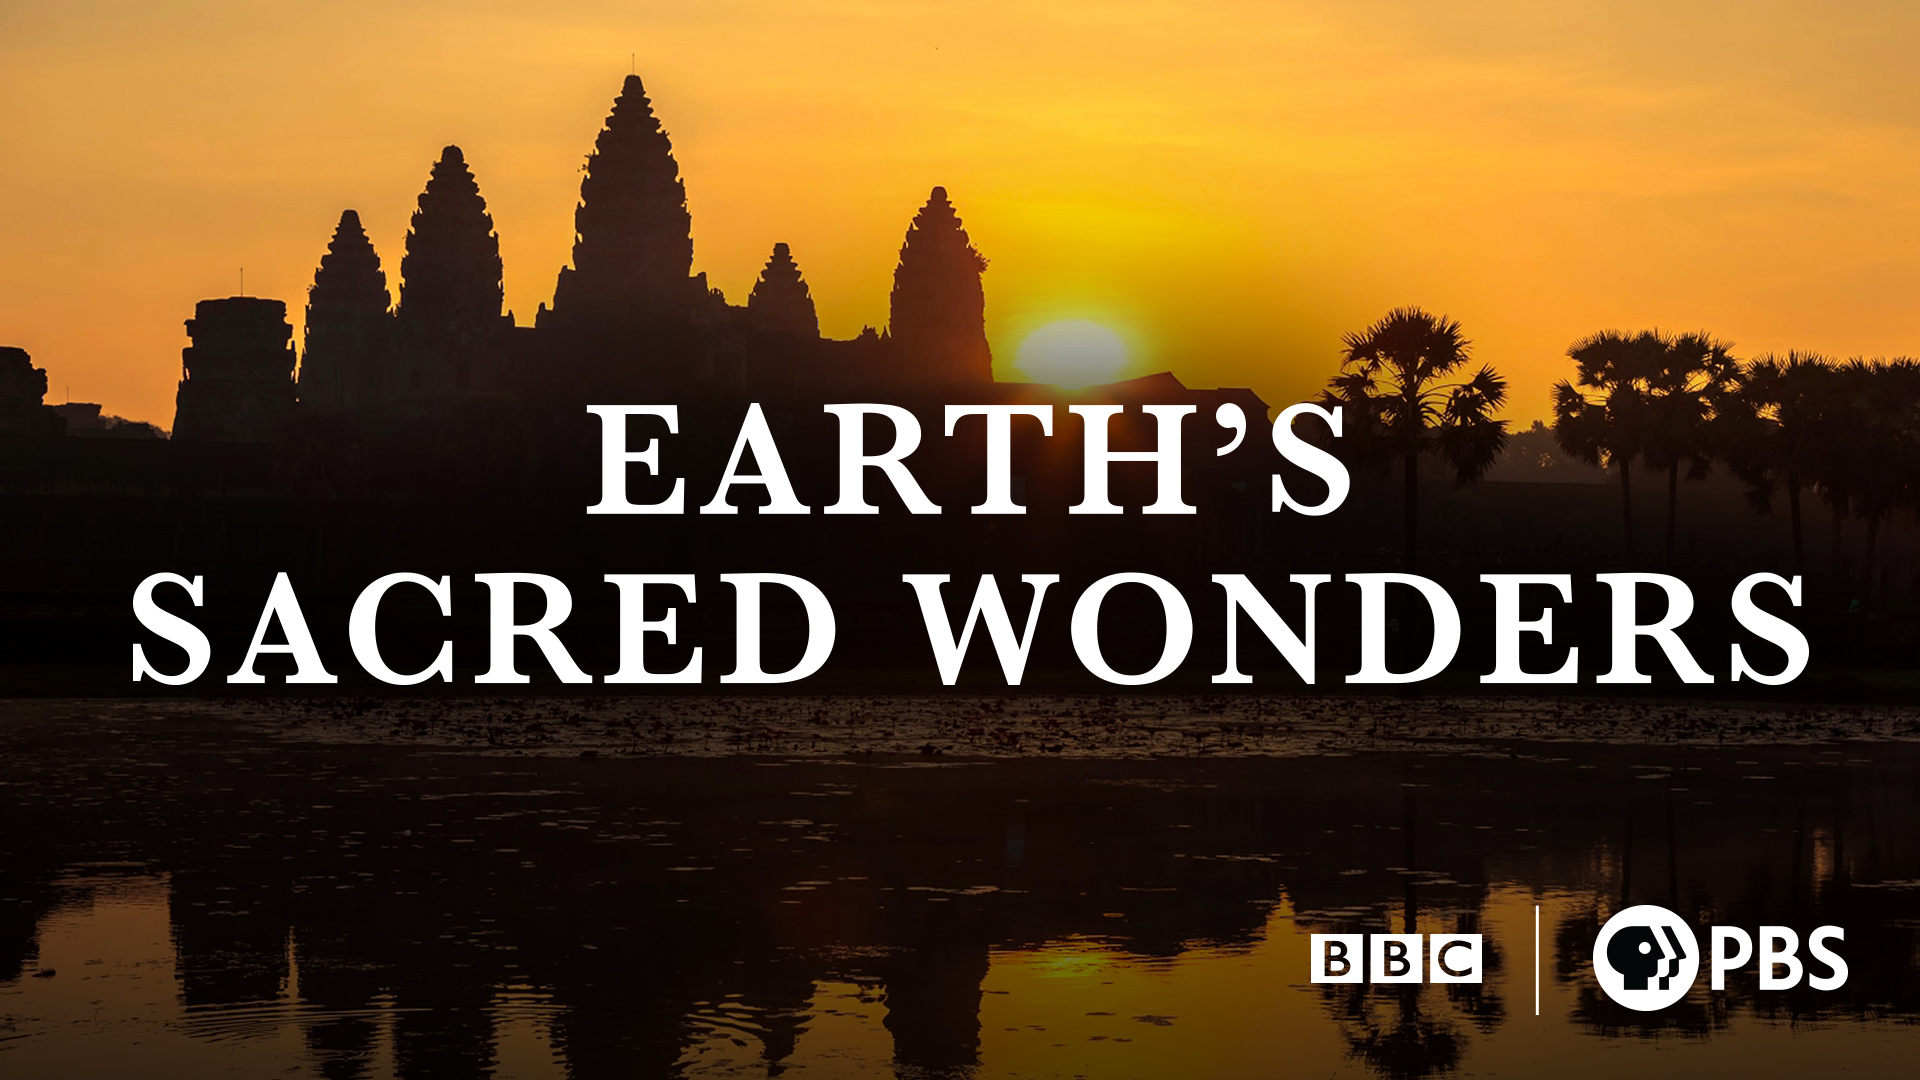 Earth's Sacred Wonders: Season 1